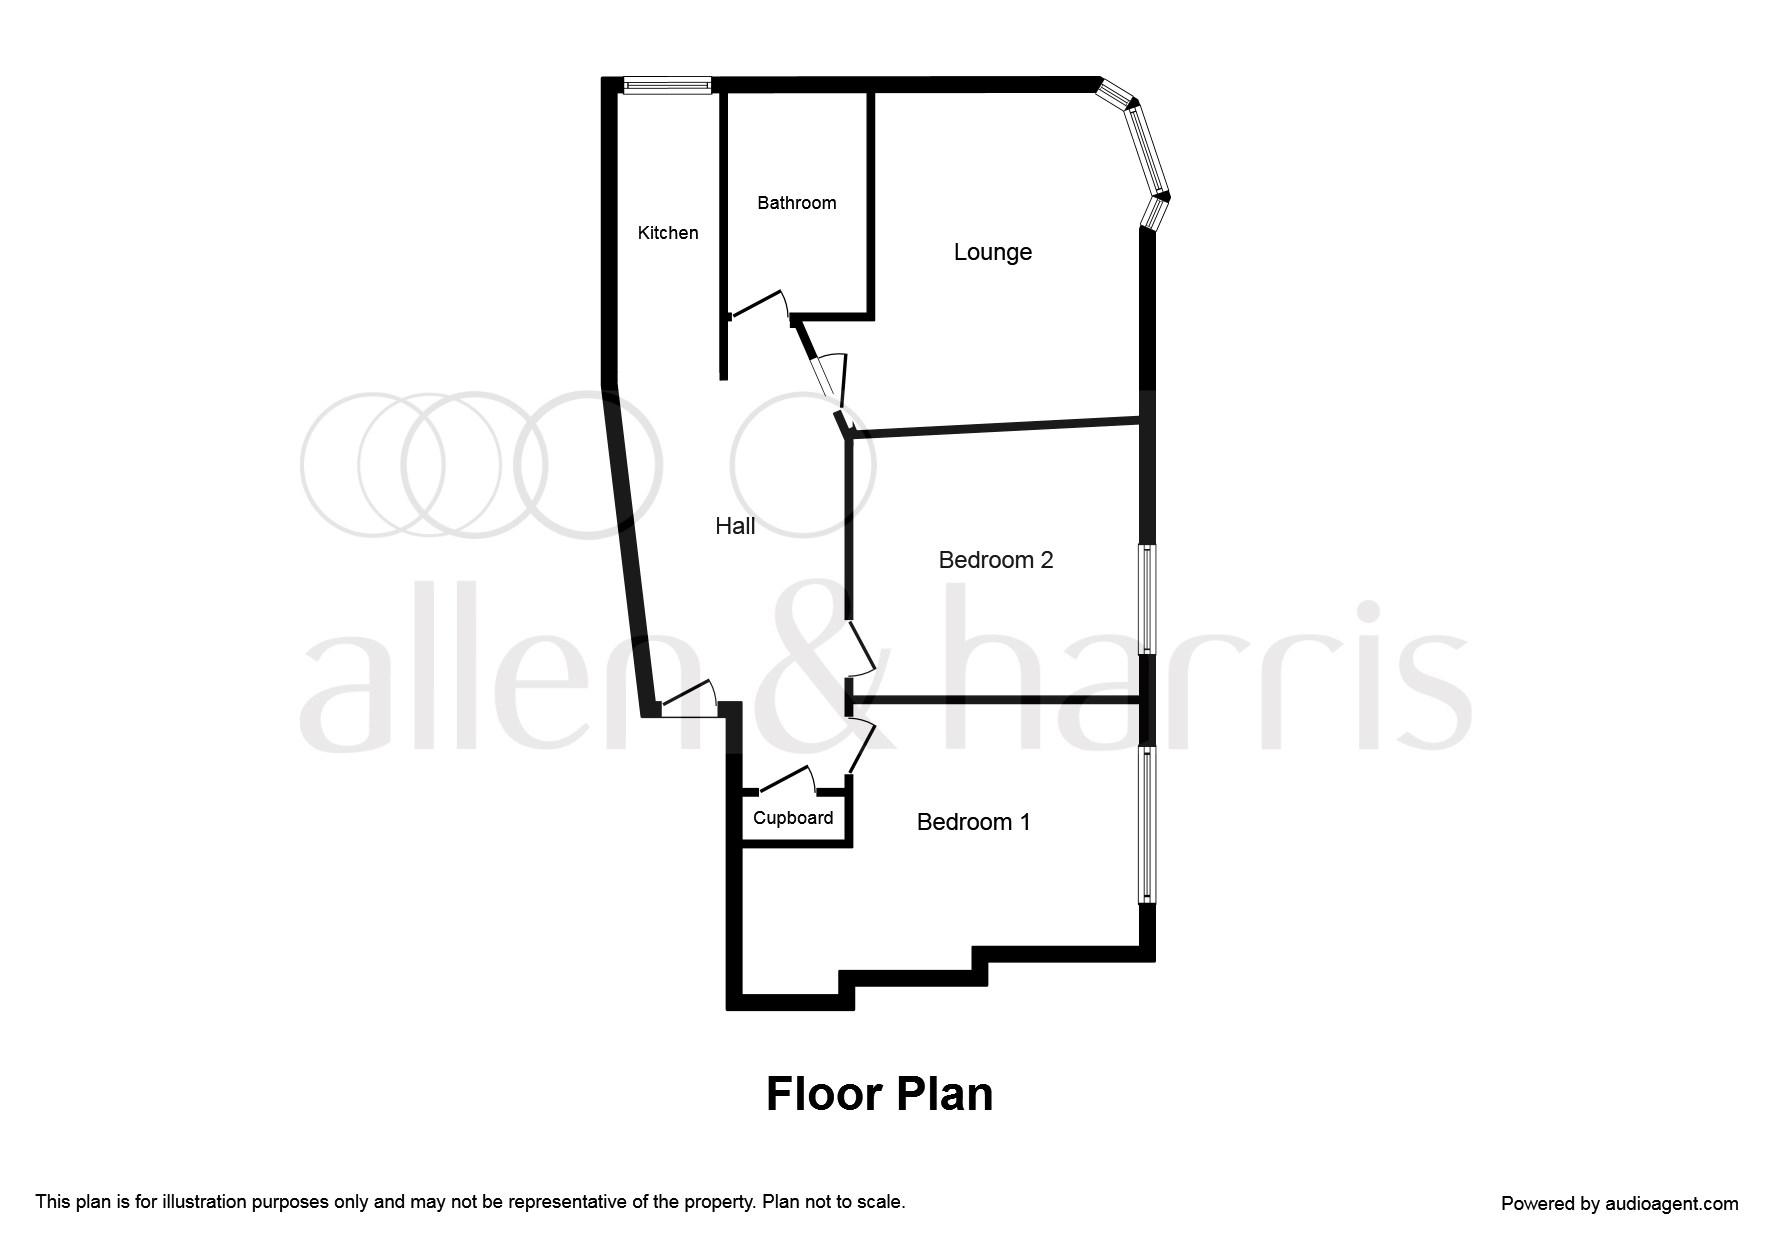 Stewart Street, Clydebank G81, 2 bedroom flat for sale